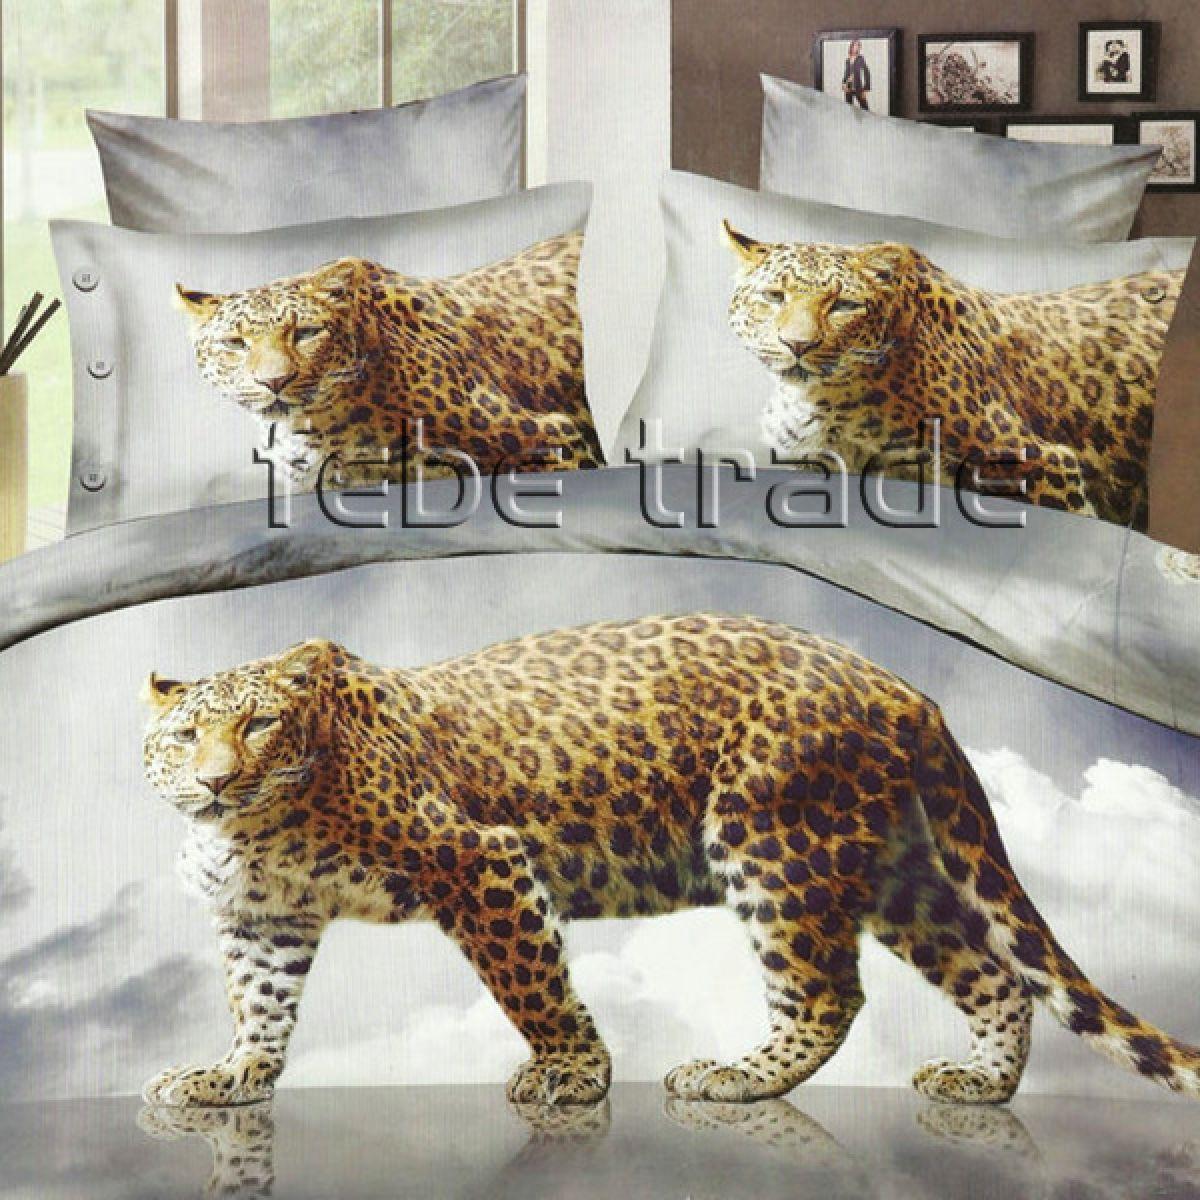 3D Beddings - Cotton World - FSH-102 - 220x200 cm - 3 cz